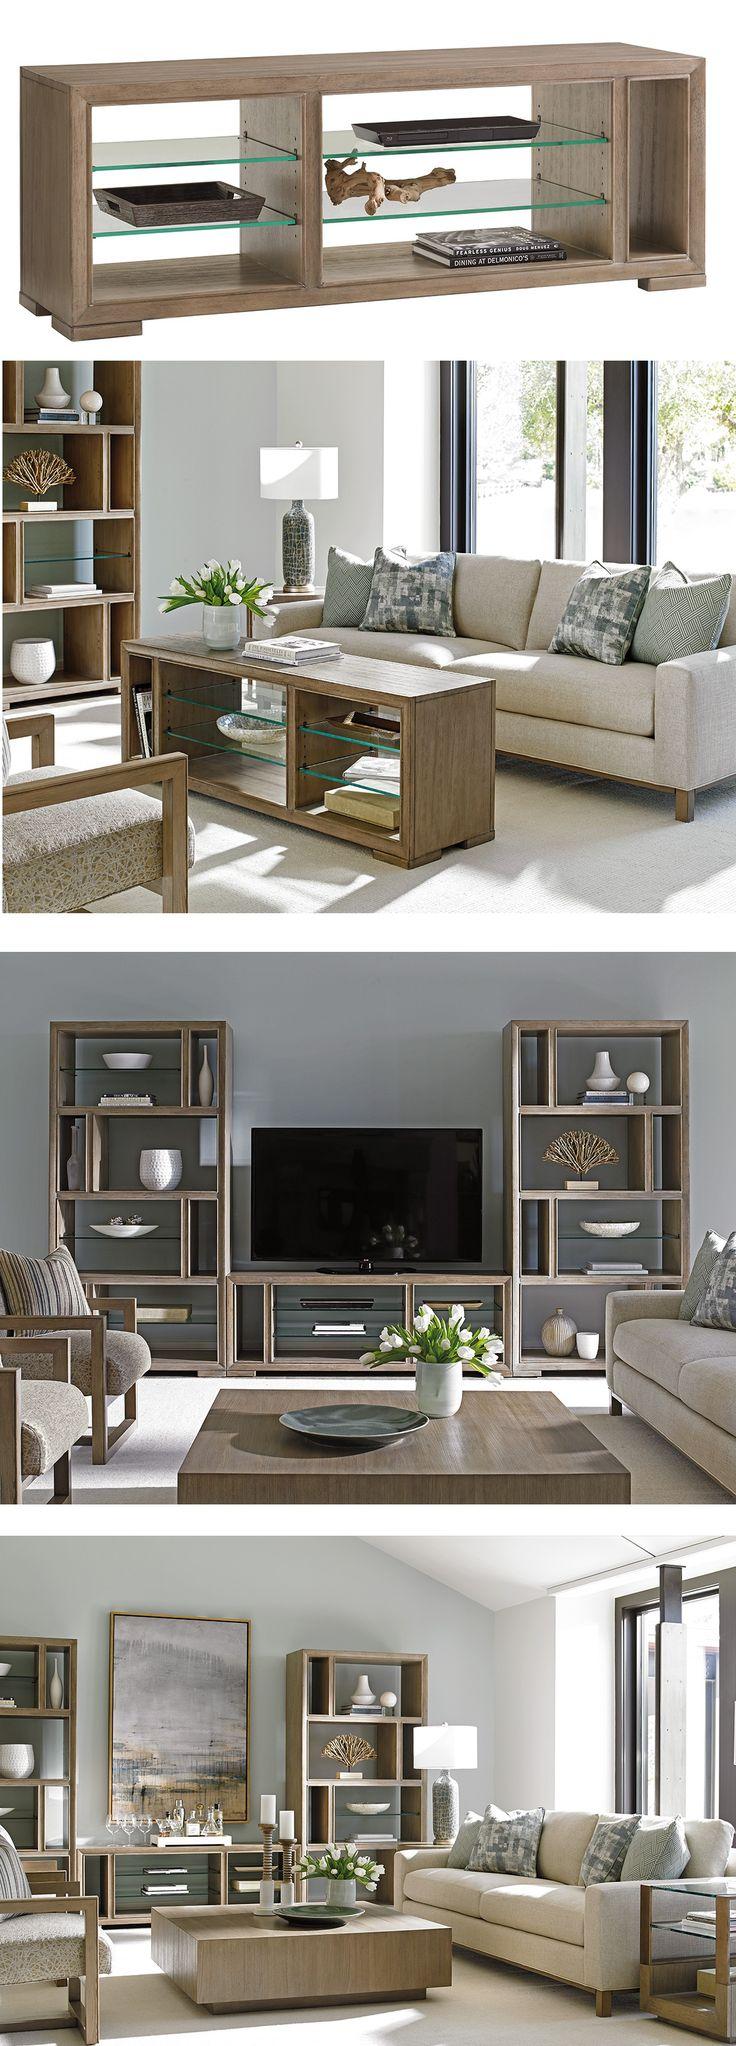 Kleiderschrank Tv Kombination: Tolles